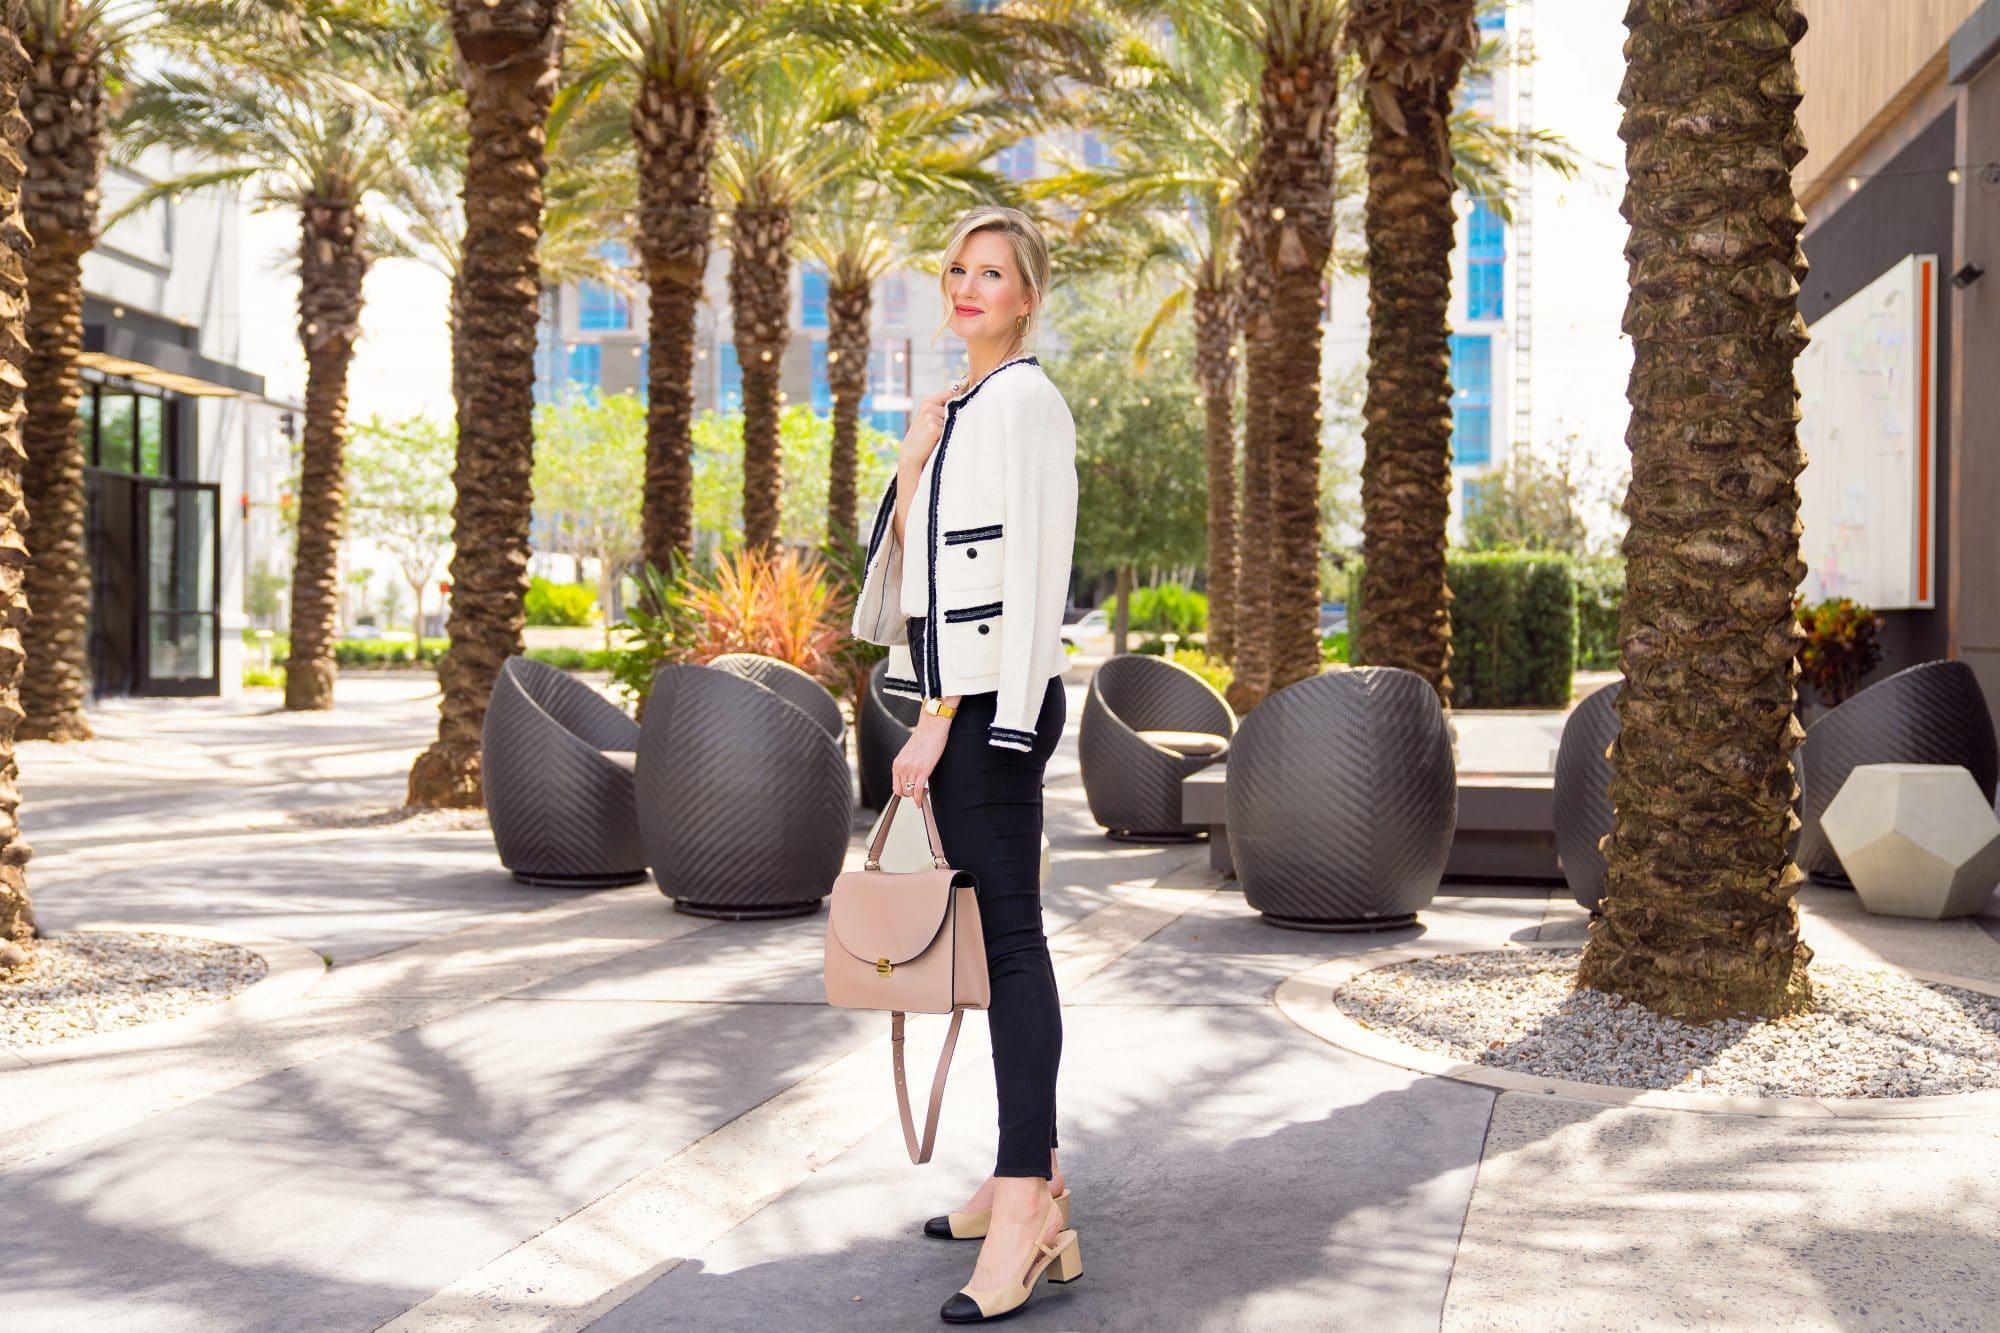 Cream and Black Tweed Chanel Jacket Look | www.ashleybrookedesigns.com